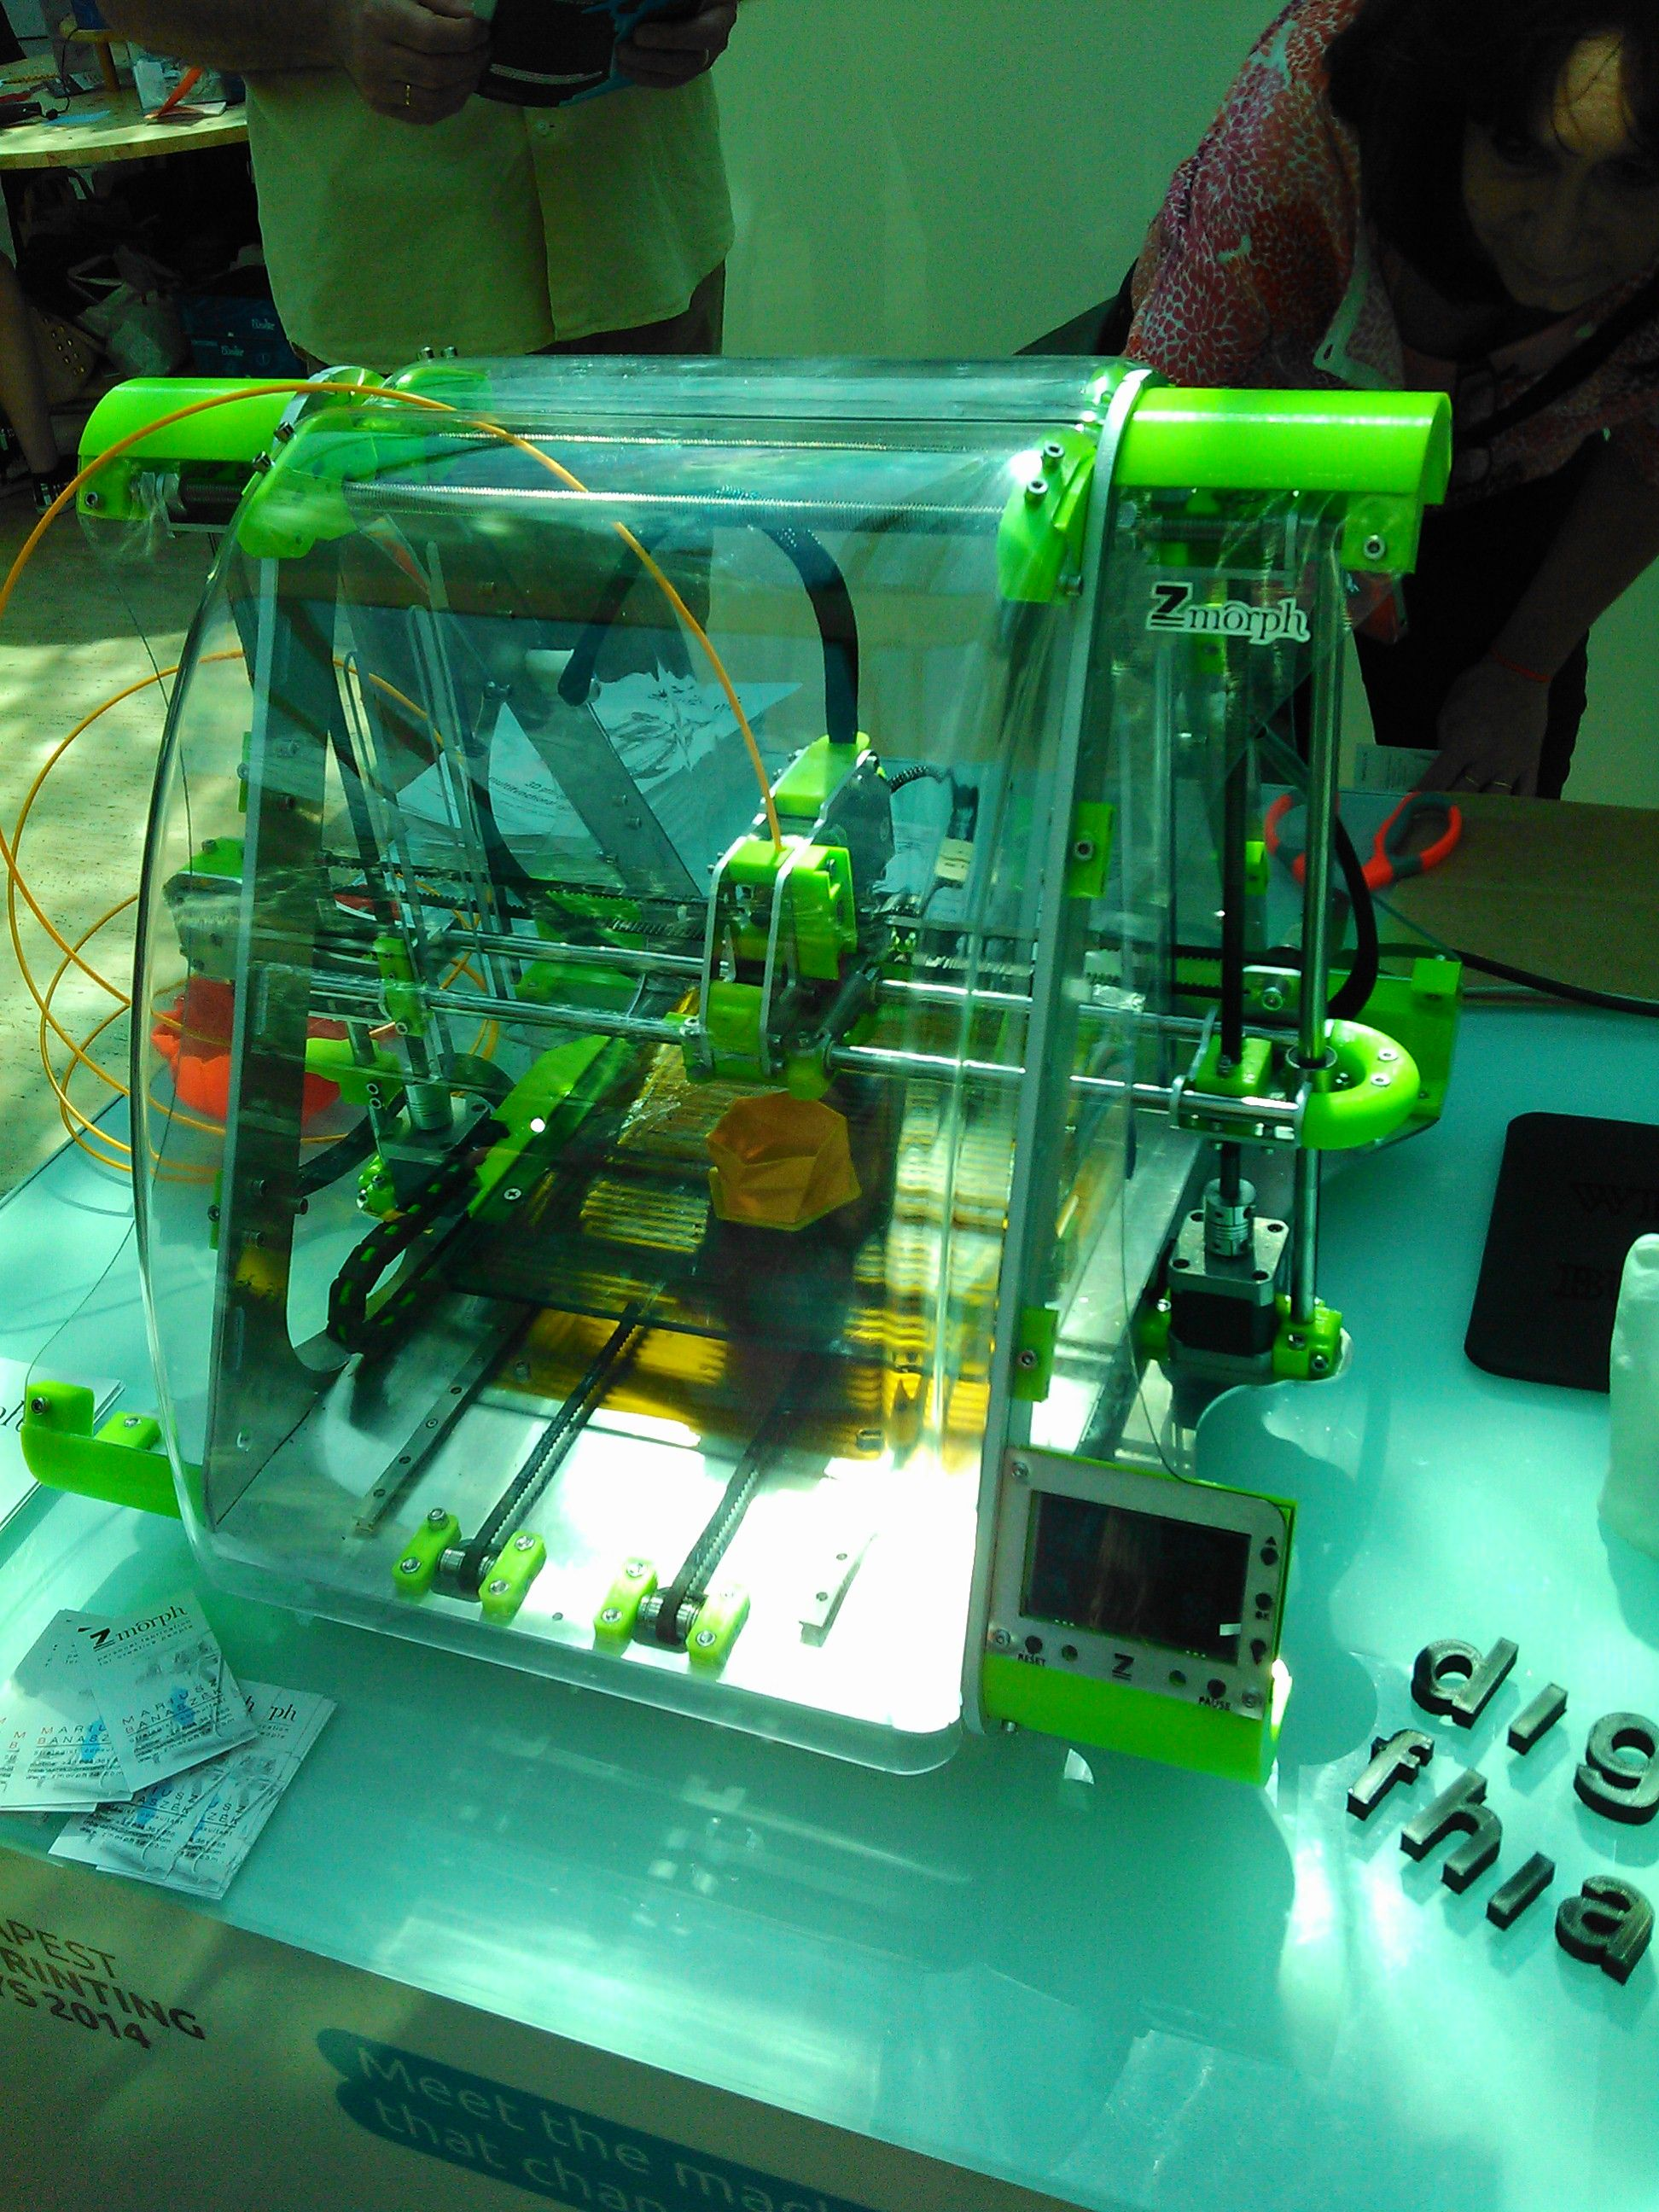 ZMorph 3D printer http://zmorph3d.com/3d-printers/